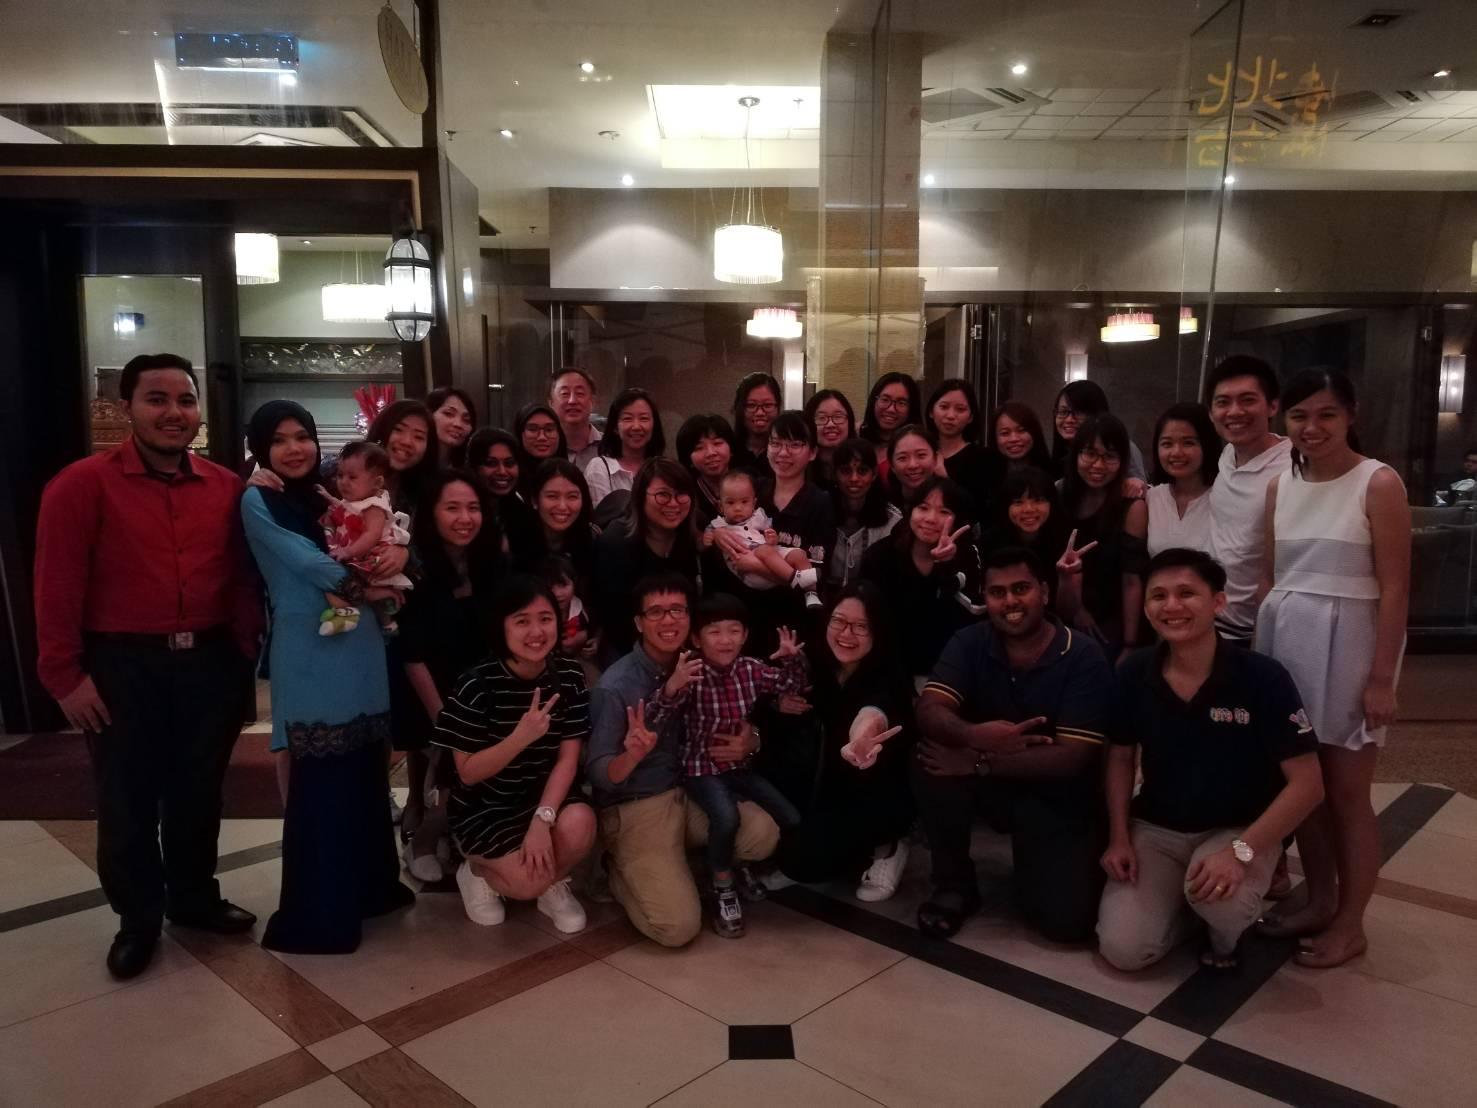 2017 Annual dinner group photo